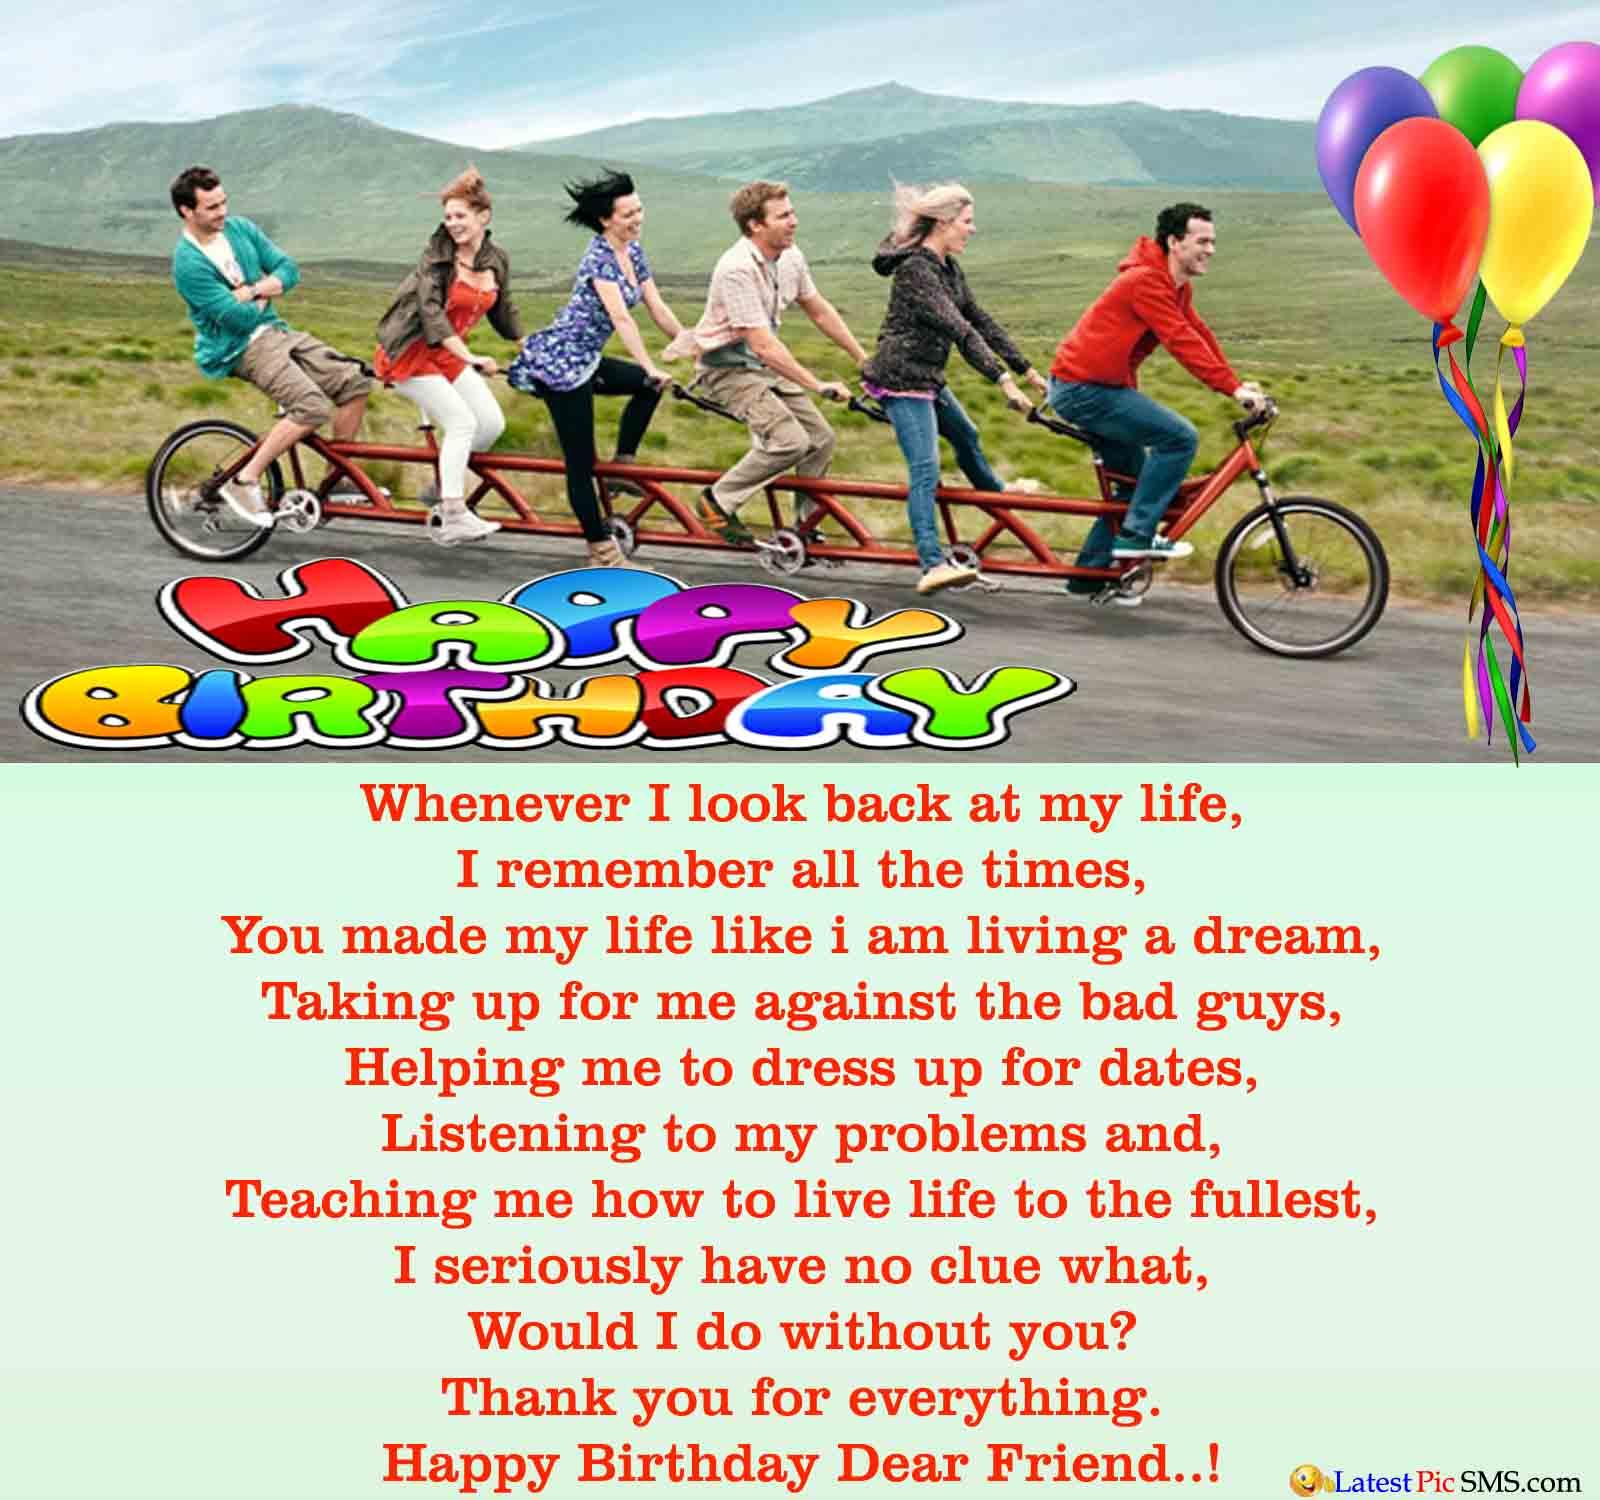 Happy birthday wishes for best friend - Happy Birthday Wishes for Best Friend for Whatsapp and Facebook